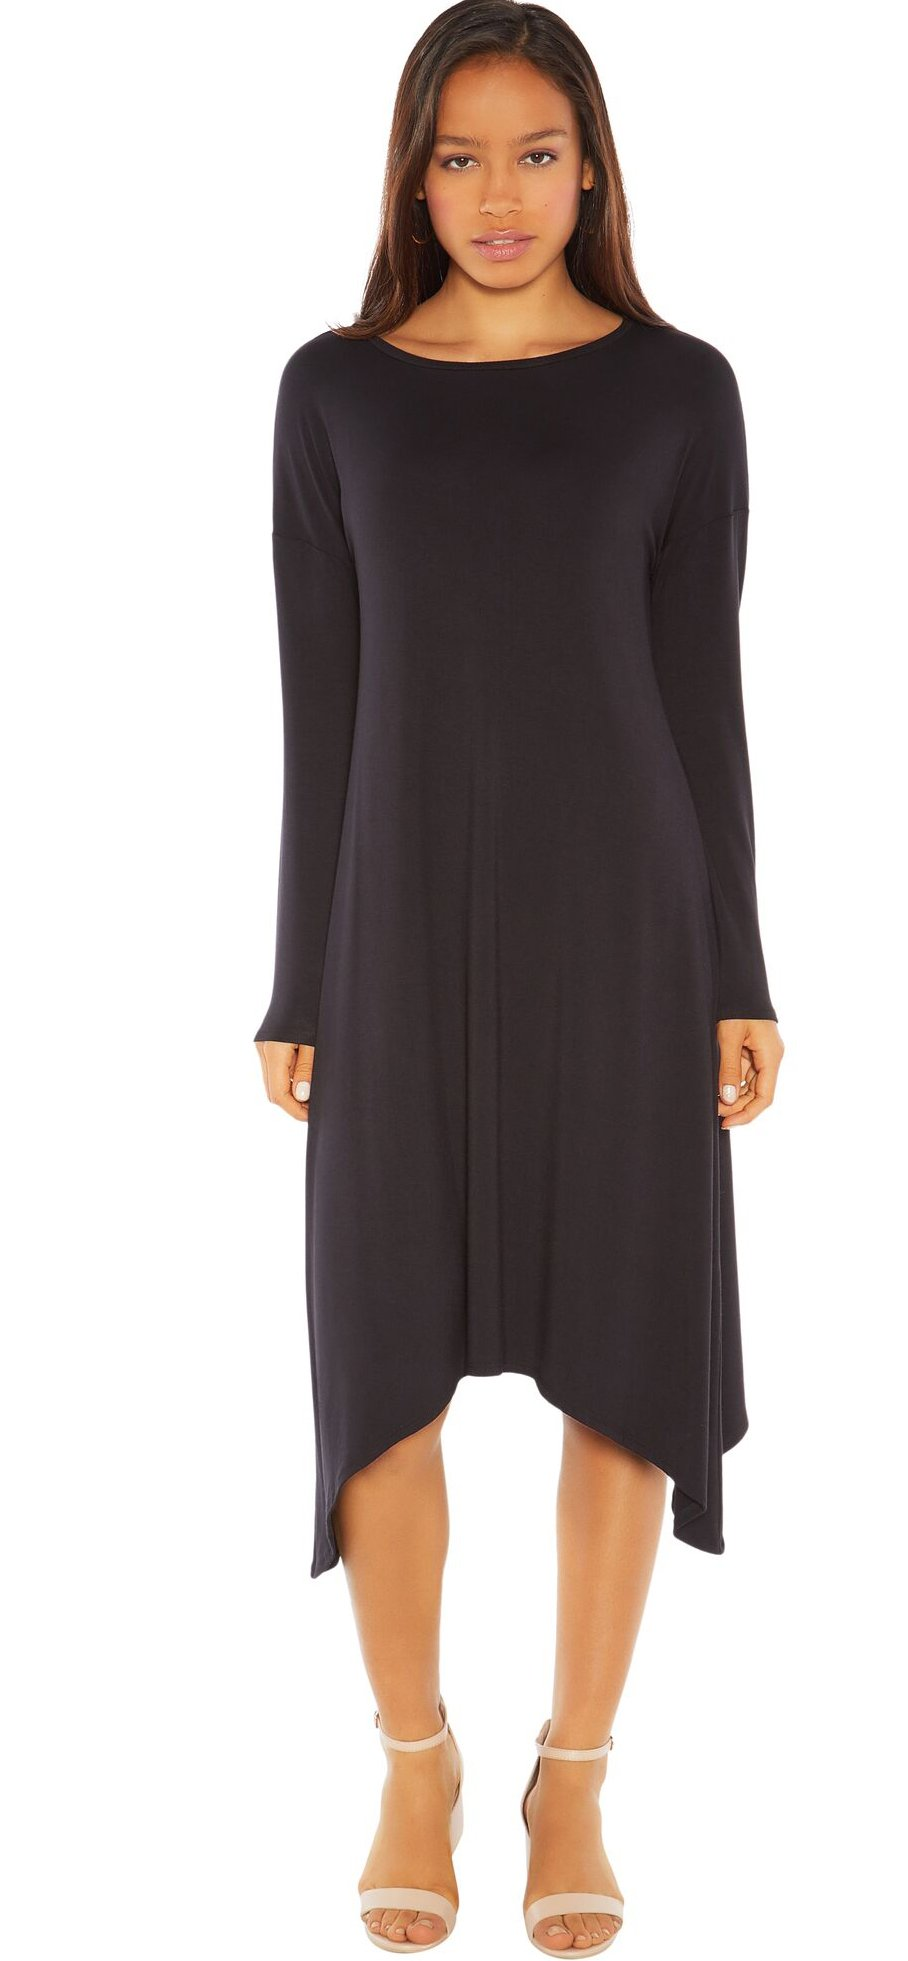 Rohb by Joyce Azria Tribeca Long Sleeve Hanky Hem Dress (Black) Size M